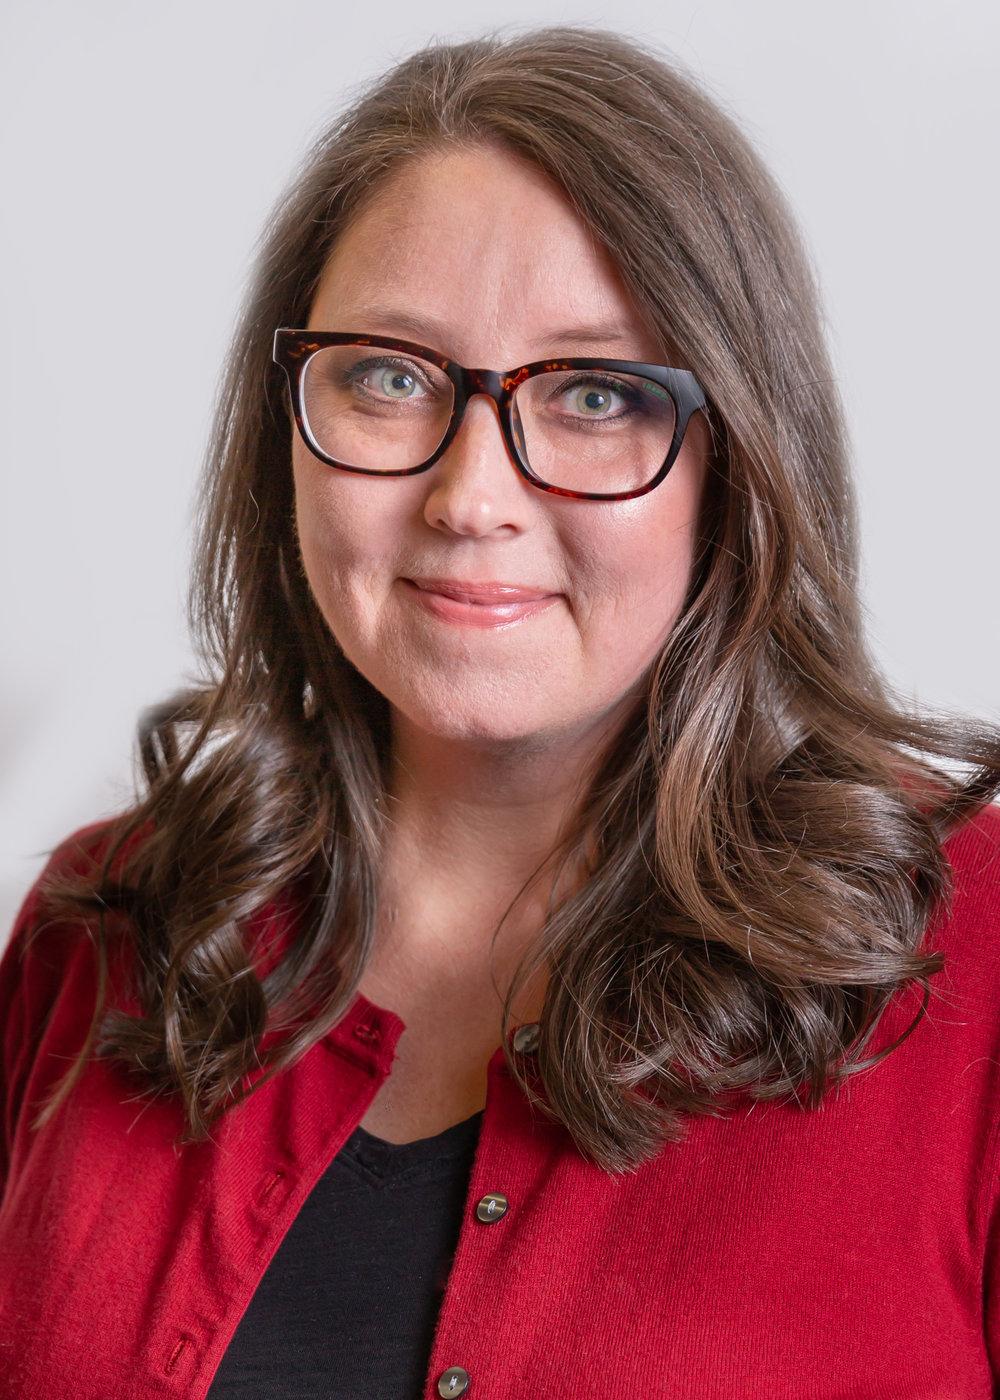 Samantha Schnettler | VTR II On staff since 2011